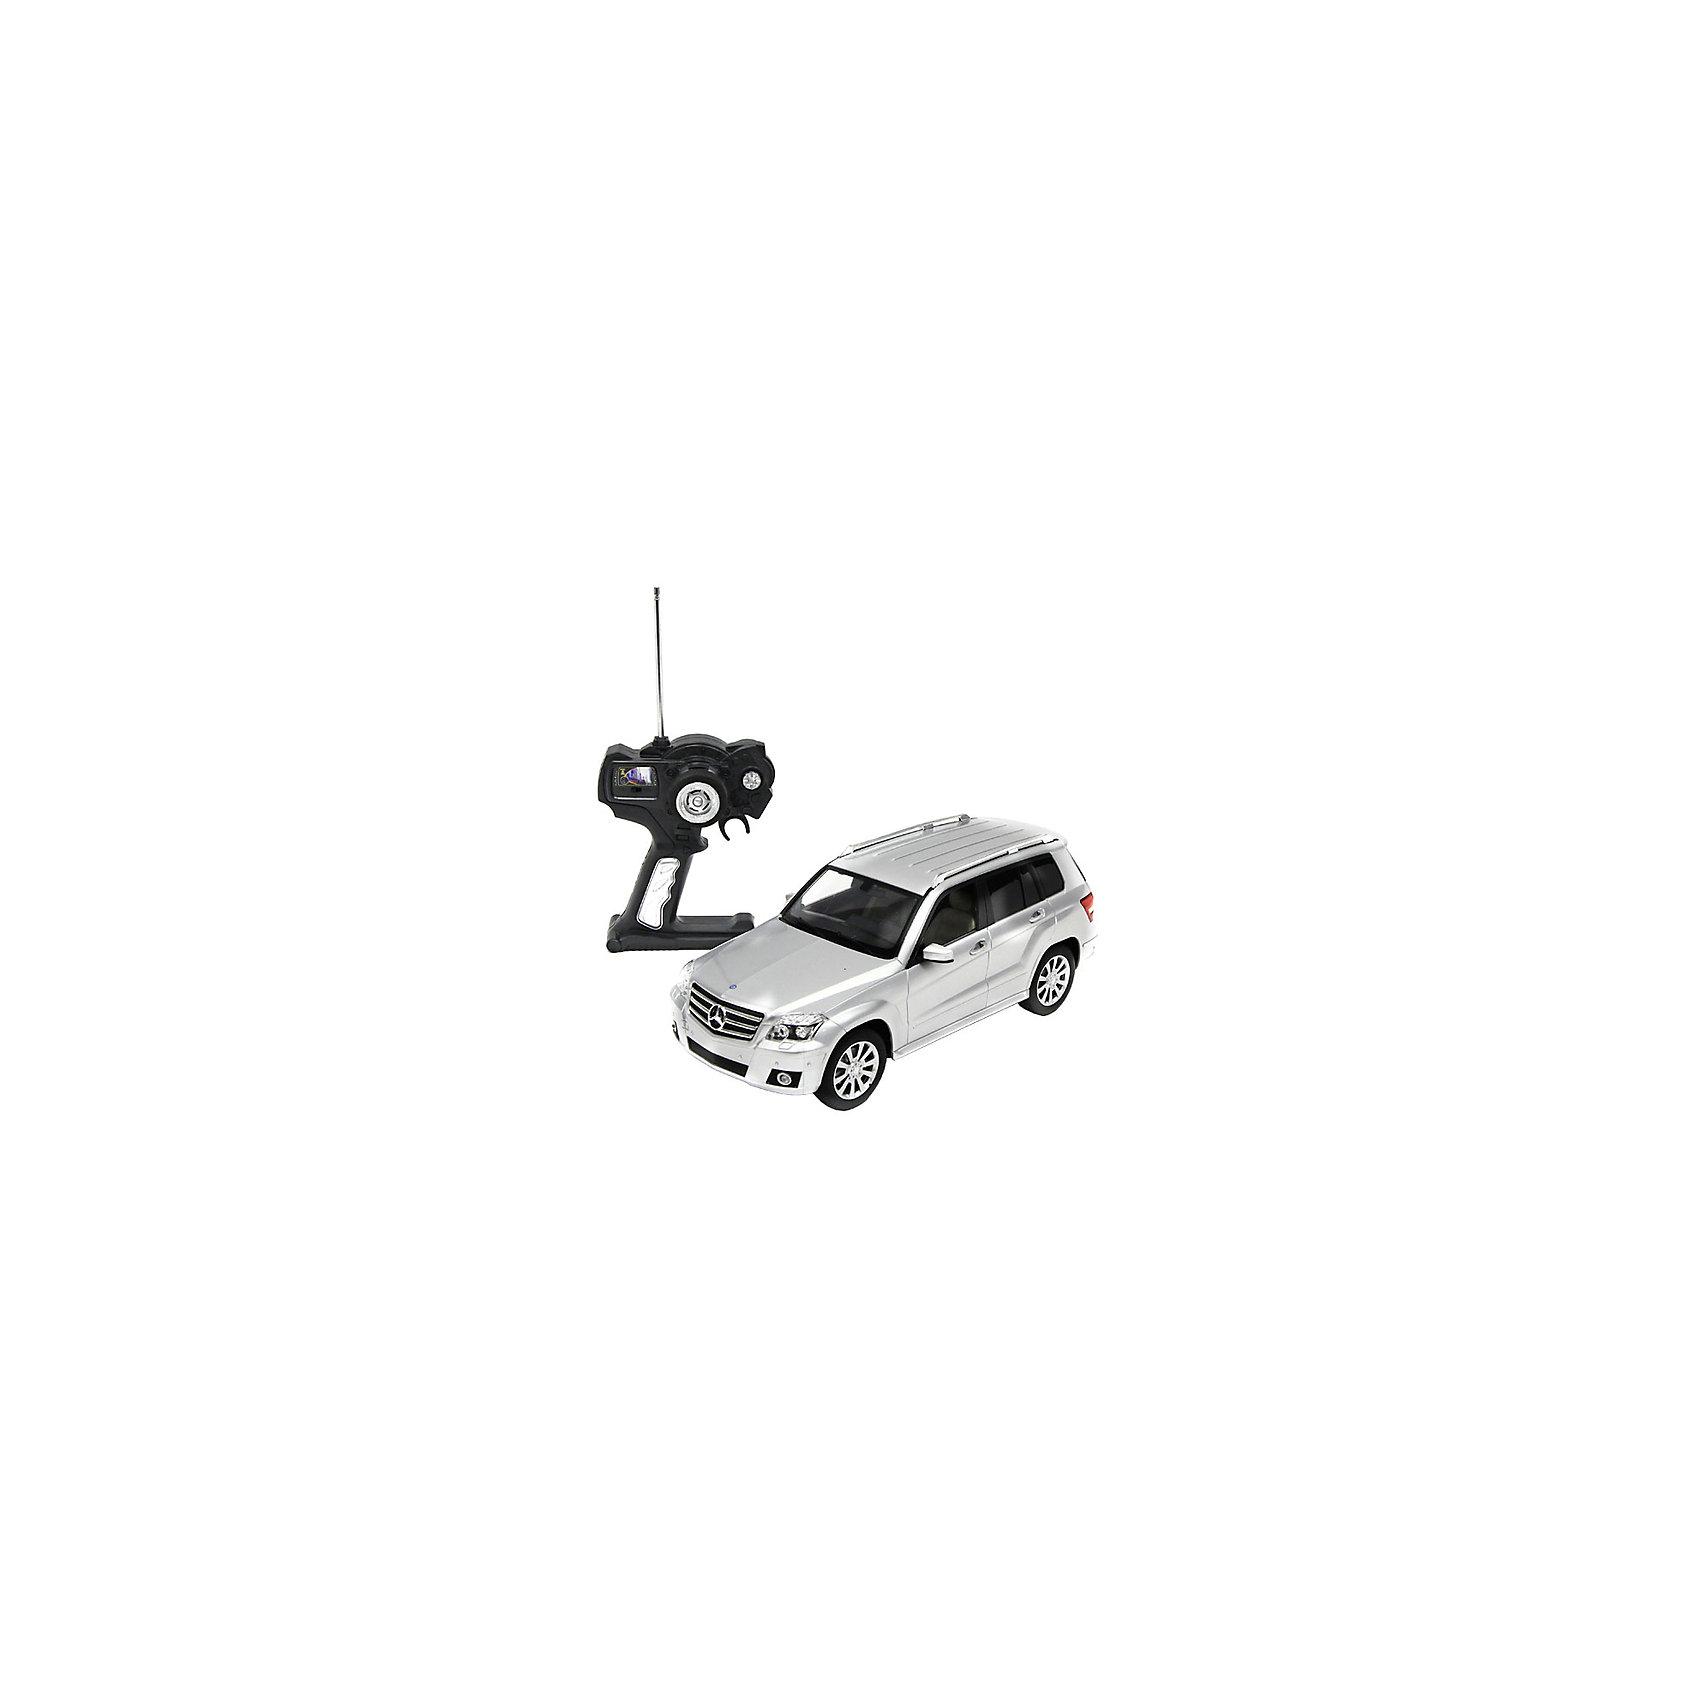 - Машина MERCEDES GLK, 1:14, со светом, р/у, RASTAR, серебристый купить автомобиль б у в донецке до 33000 грн